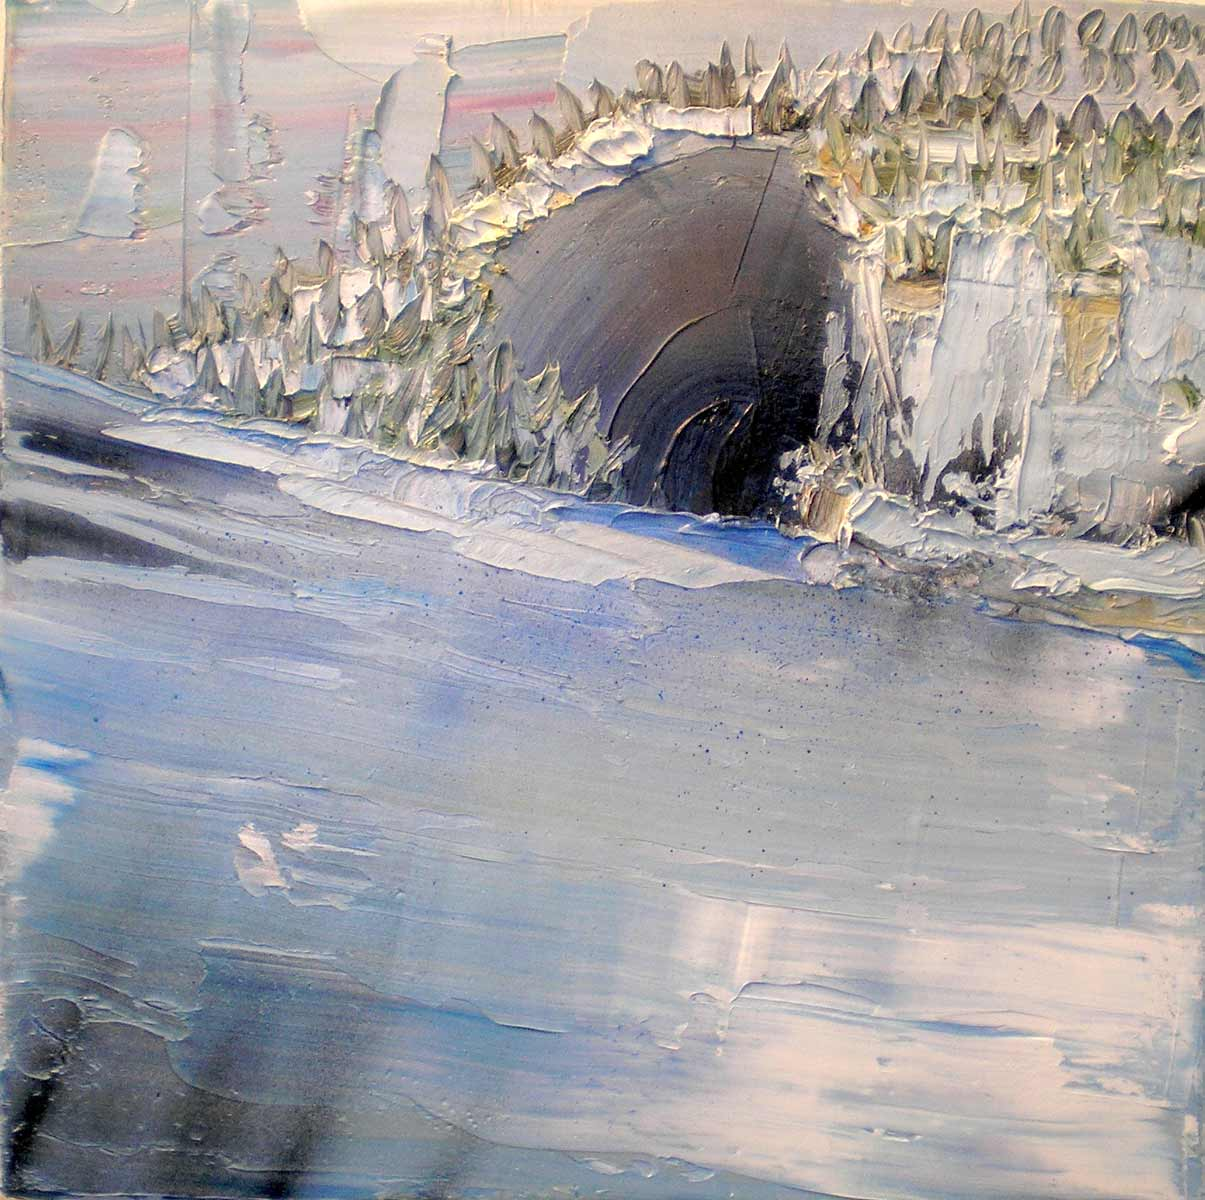 Snow Cave, 2010